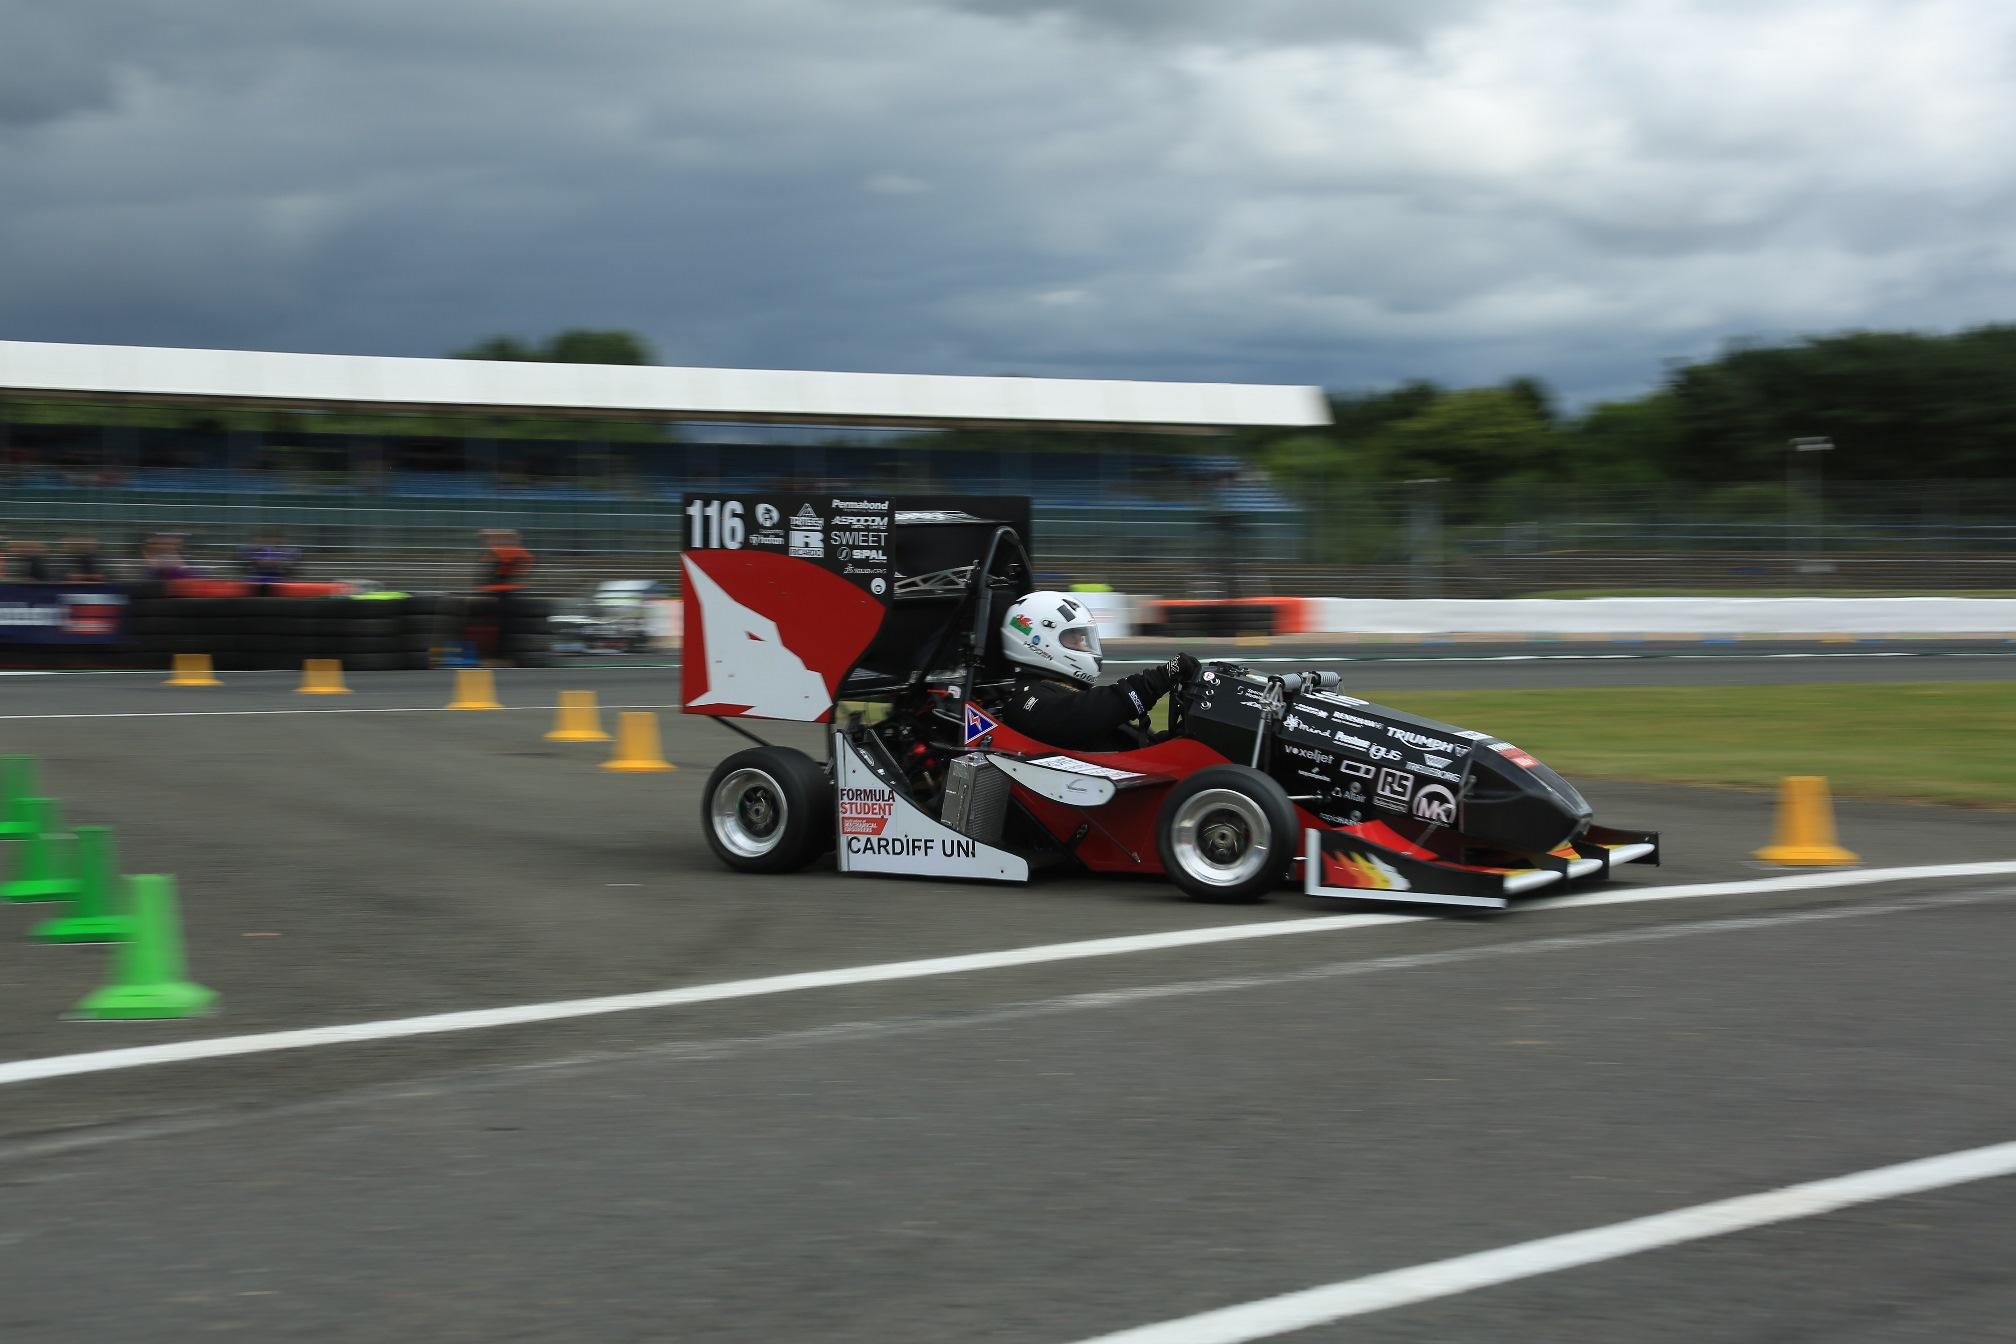 Cardiff University formula student racing